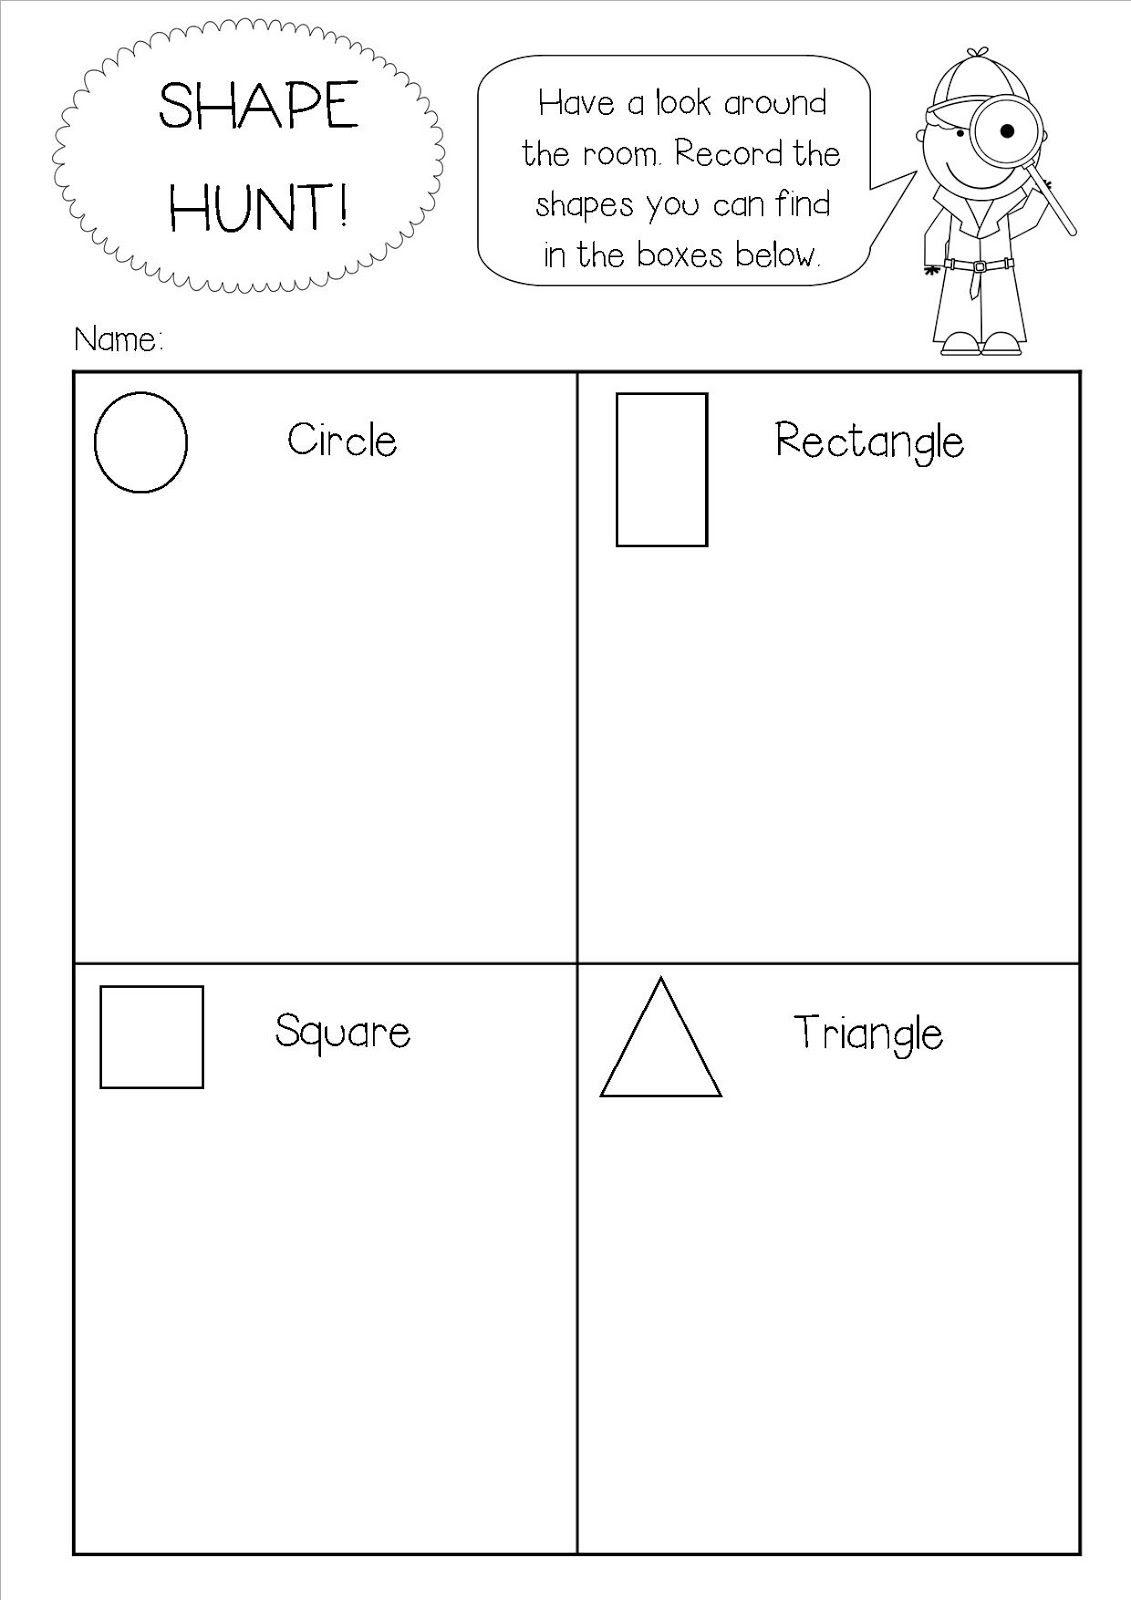 Shape Hunt Jpg 1 131 1 600 Pixels Teaching Shapes Shape Activities Kindergarten Shapes Kindergarten [ 1600 x 1131 Pixel ]